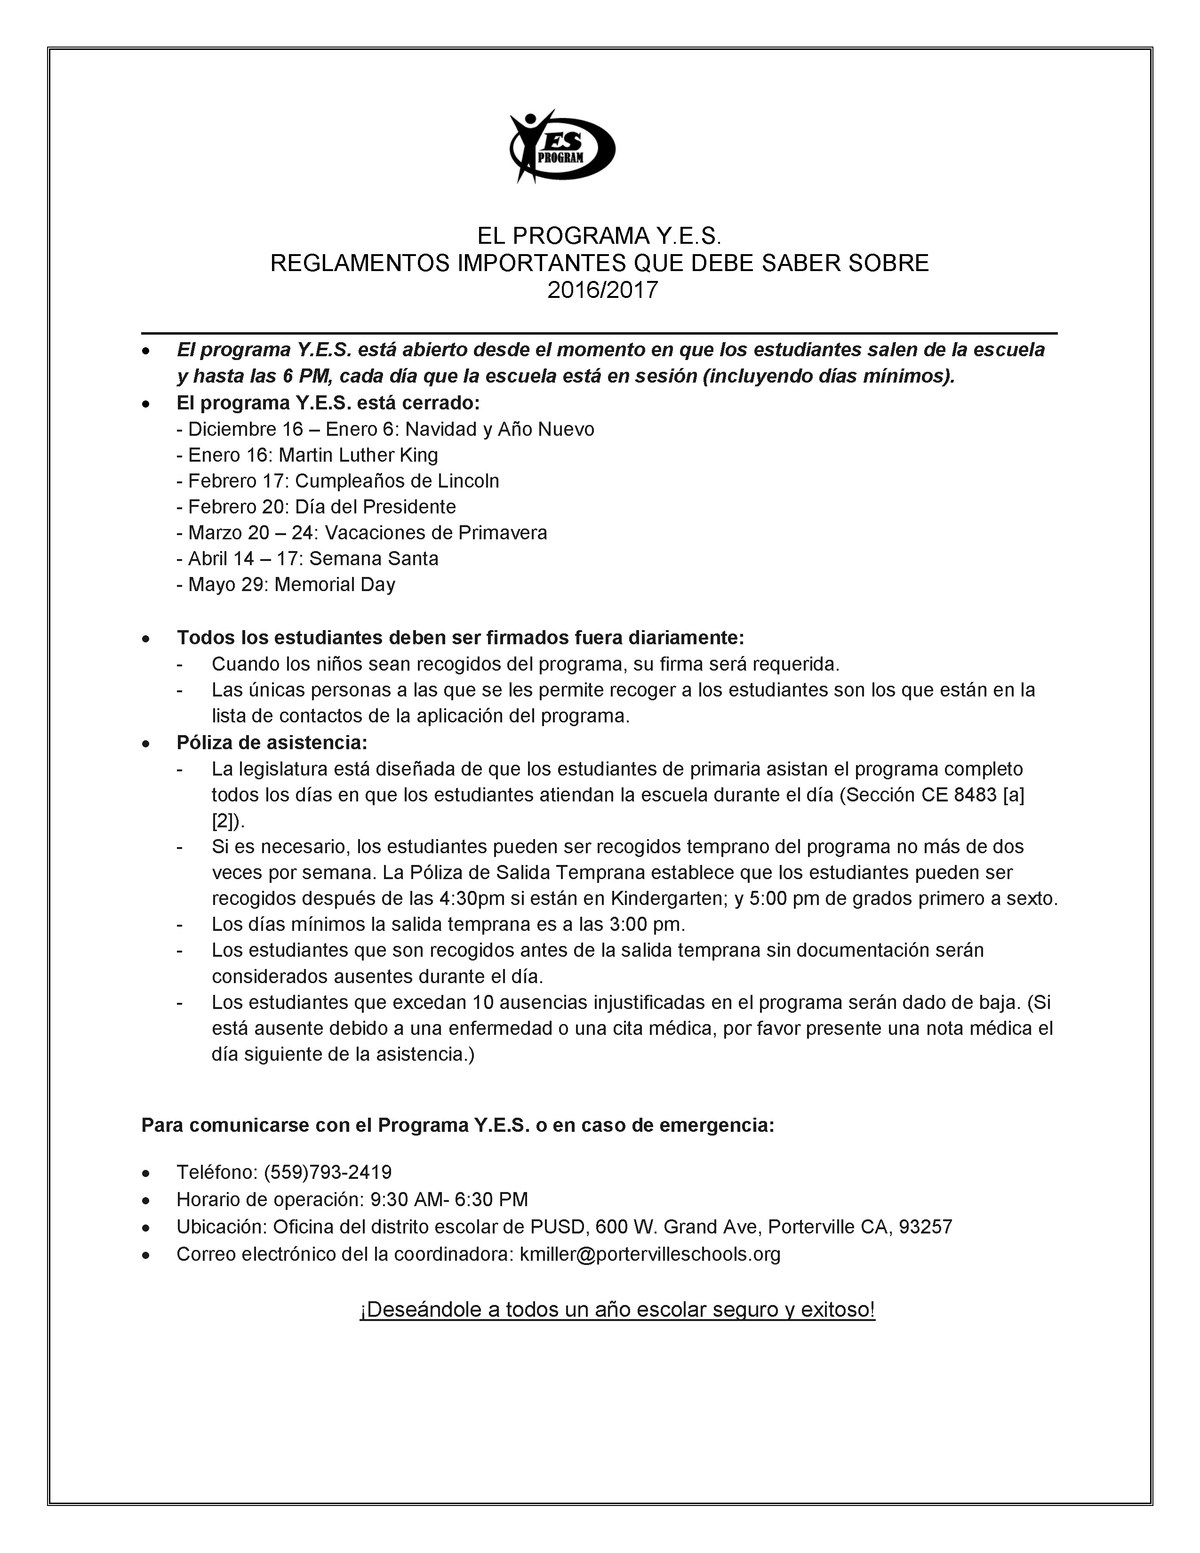 YES Program Facts (Spanish)